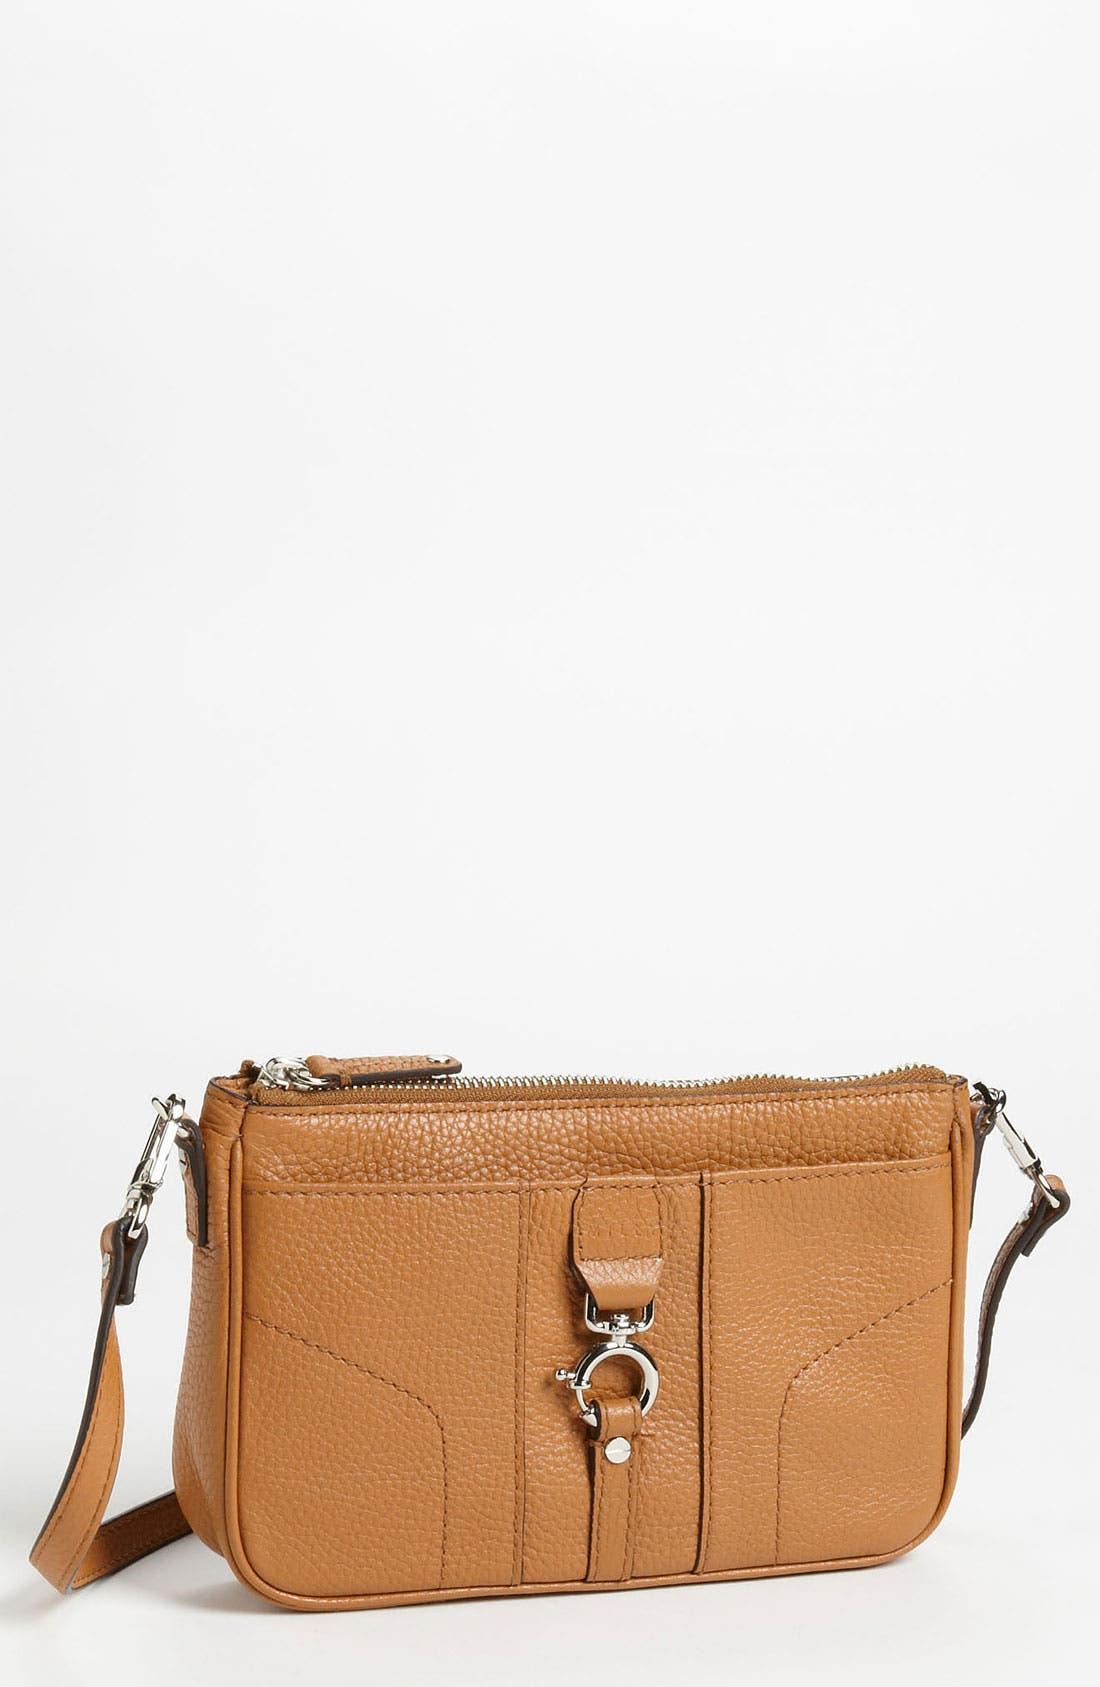 Main Image - Milly 'Felicity' Crossbody Bag